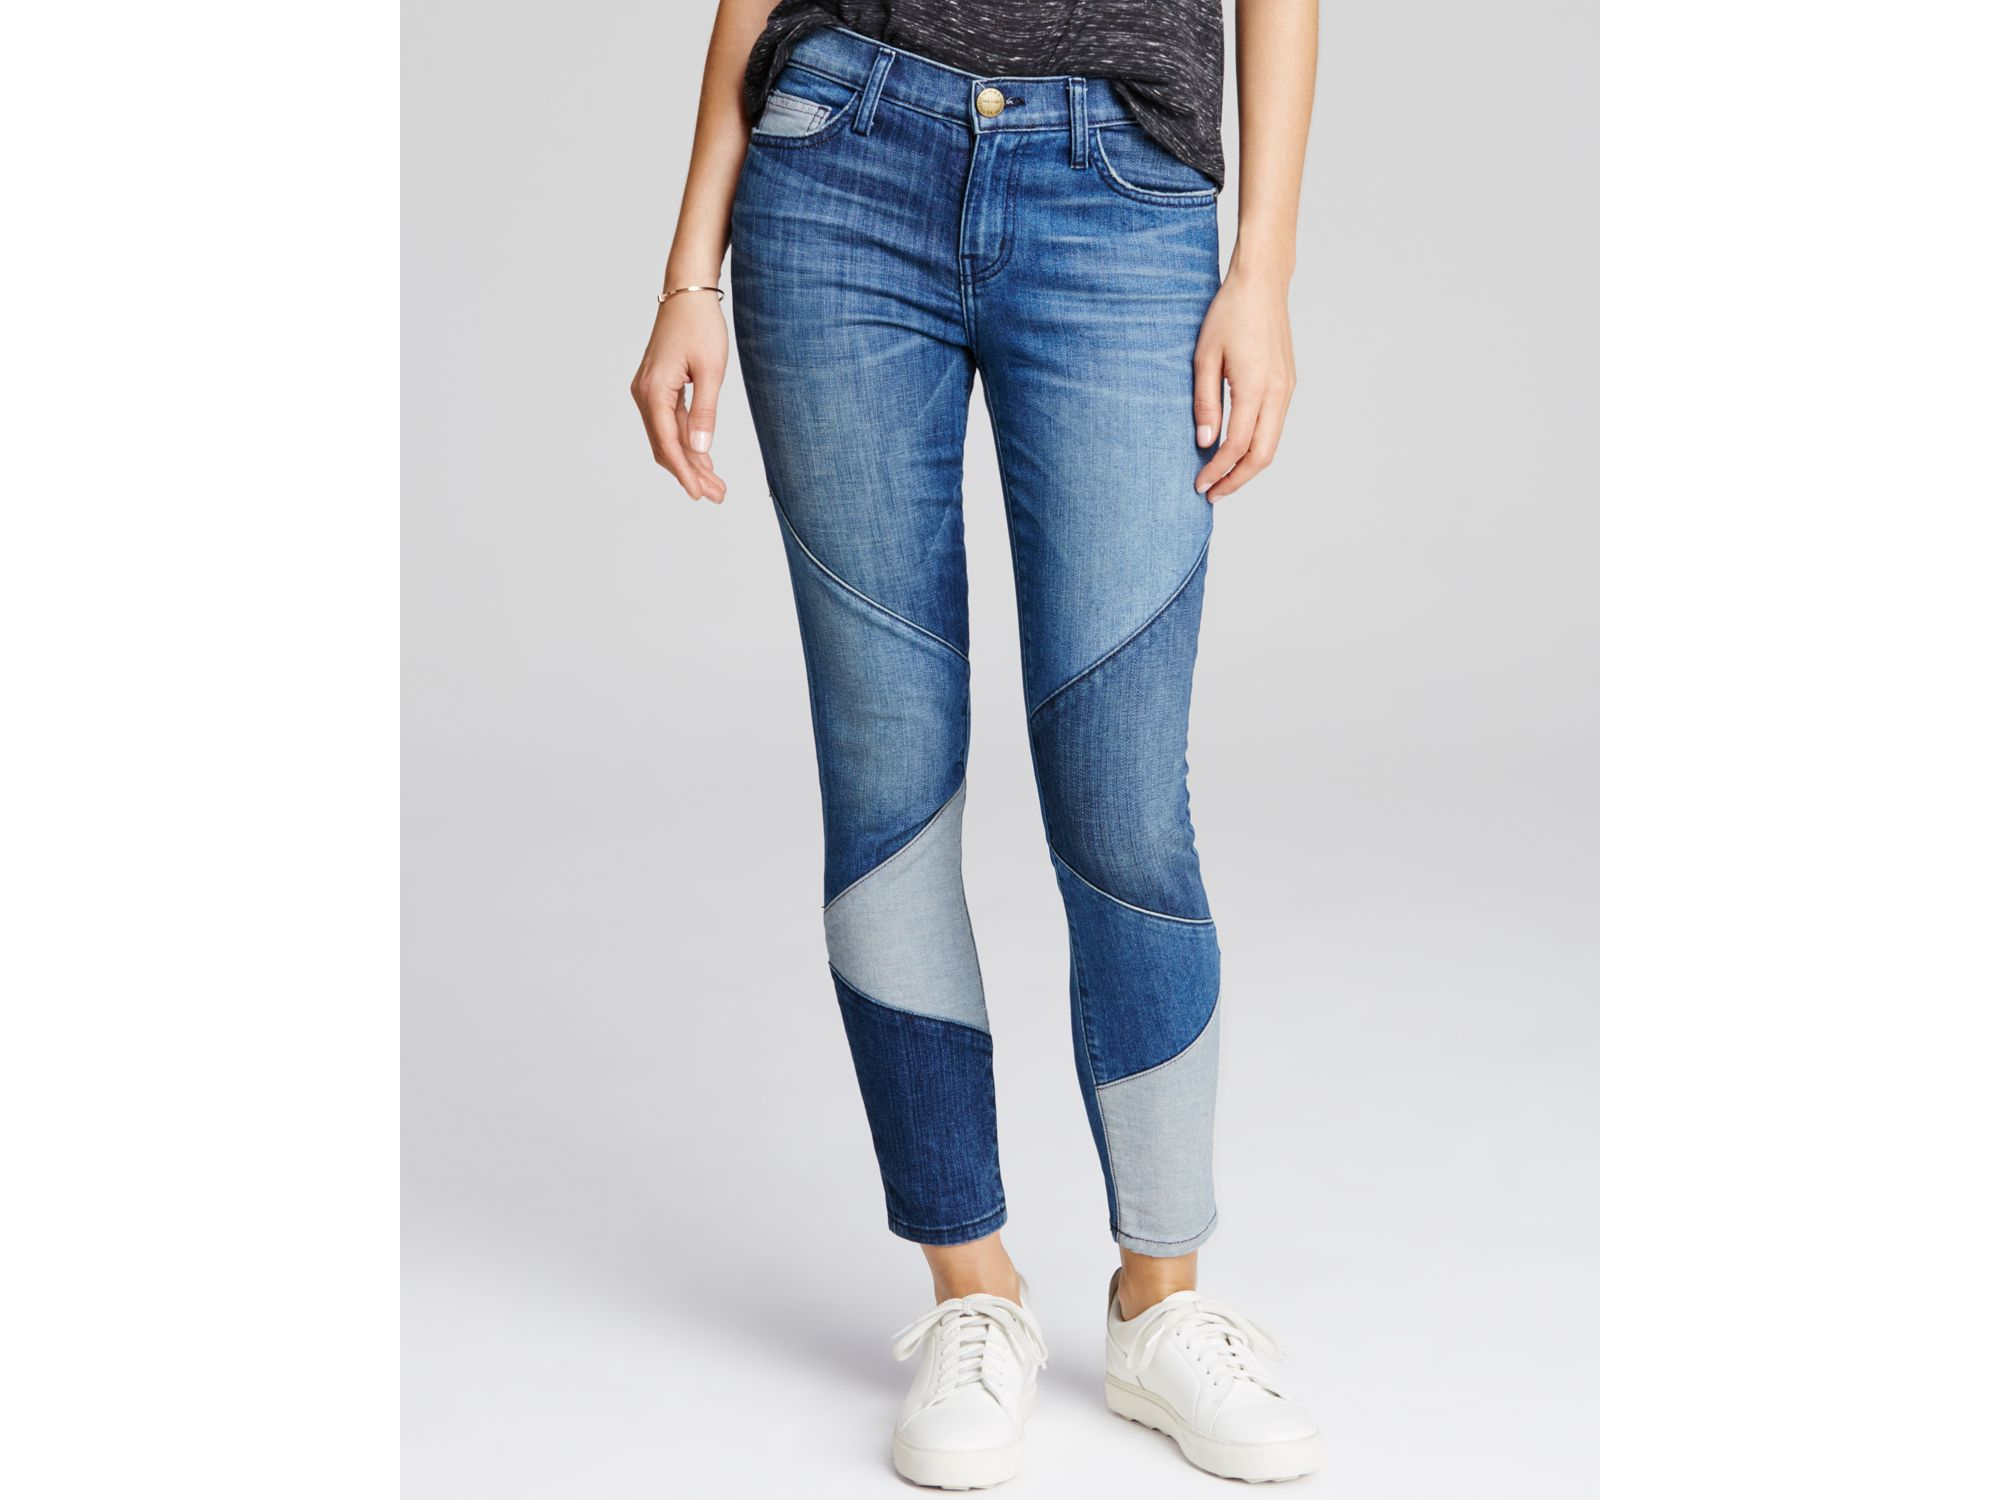 Current/elliott Stiletto Patchwork Jeans in Blue Lyst